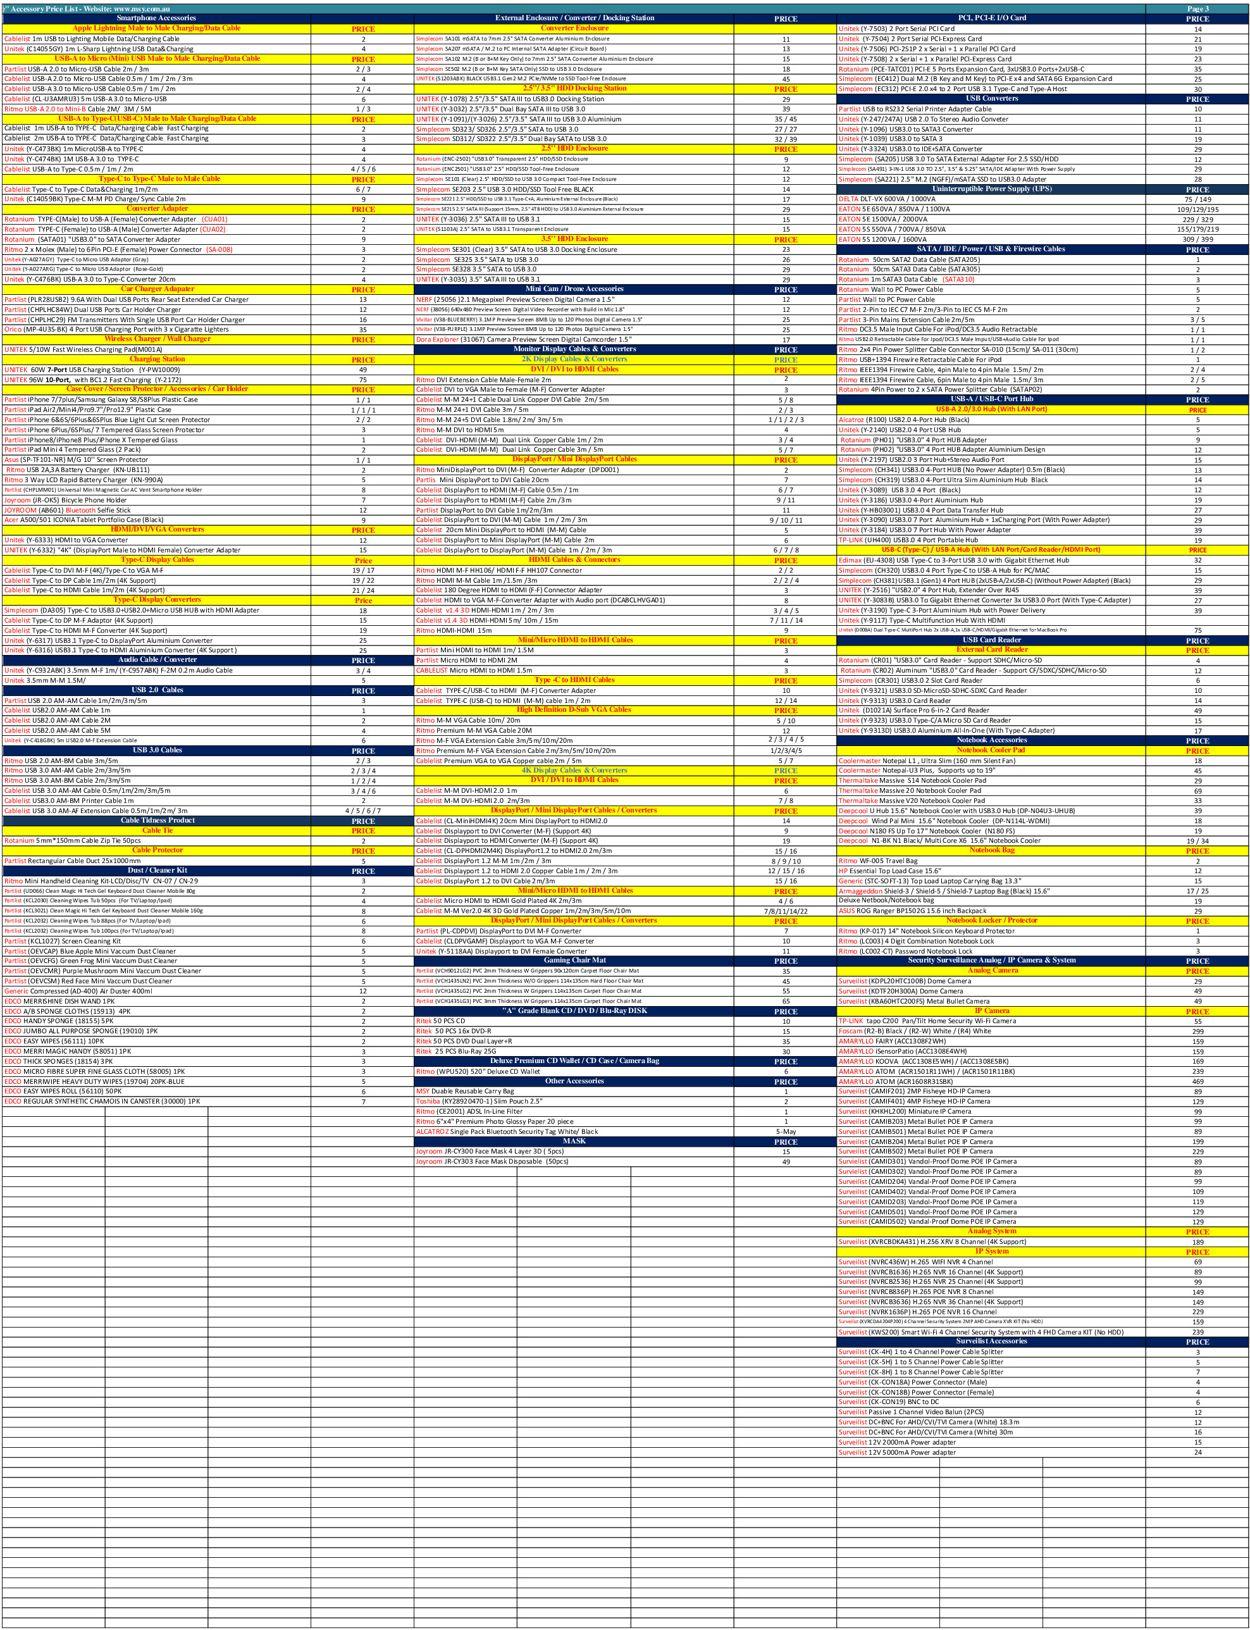 MSY Technology Catalogue - 05/02-05/02/2021 (Page 3)